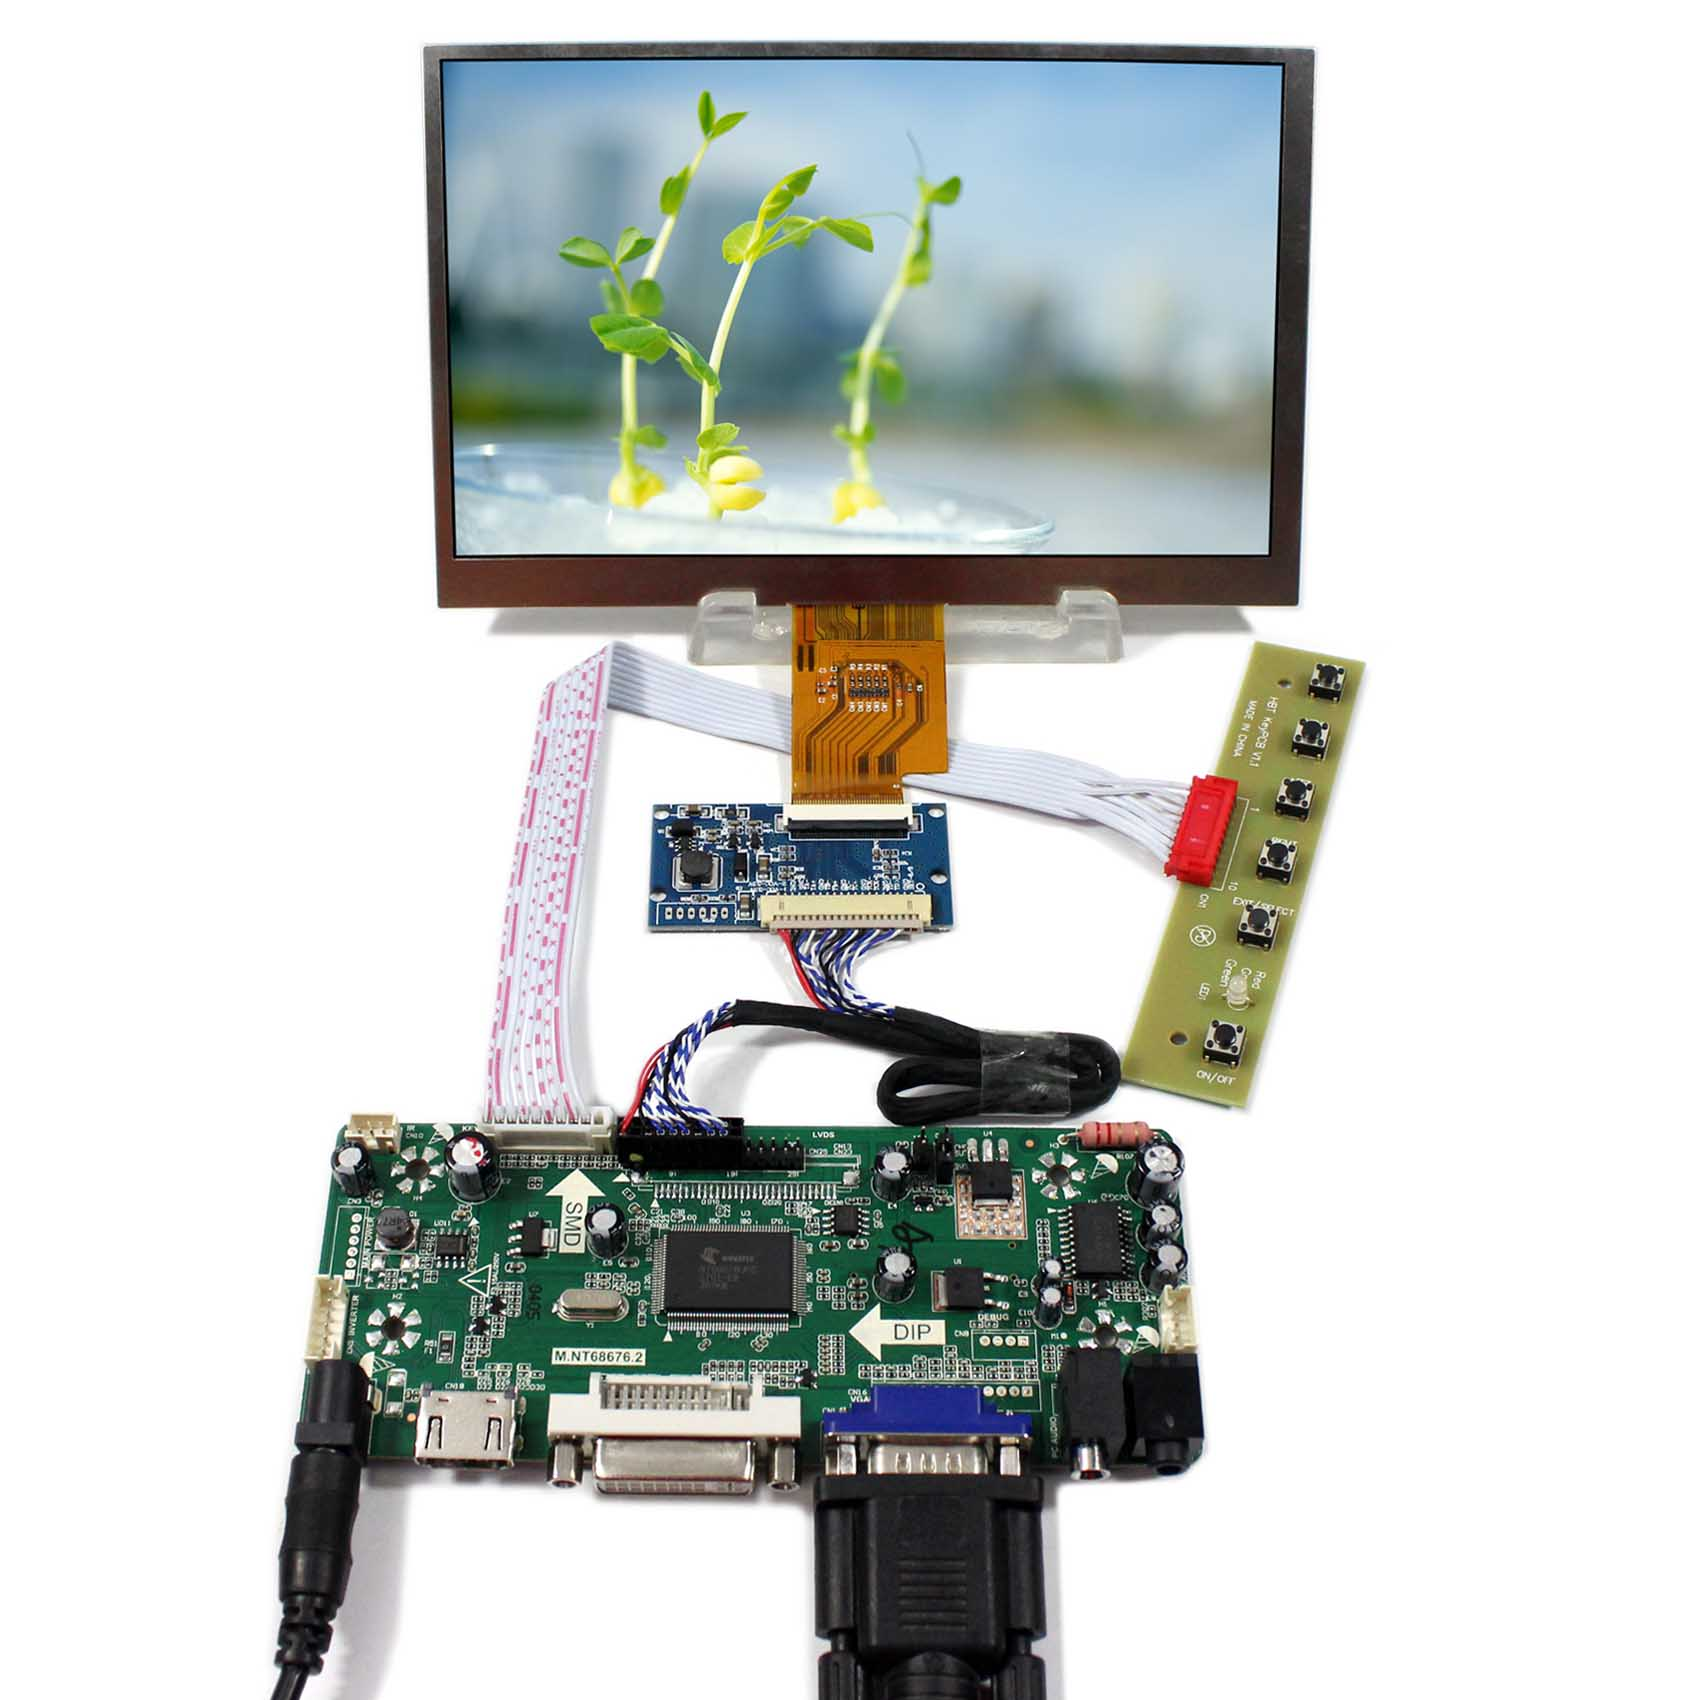 7inch LCD Screen 1024X600 AT070TNA2 HDMI DVI VGA LCD Controller Board M.NT68676 vga 2av reversing lcd controller board with 7inch 1024x600 at070tna2 lcd screen